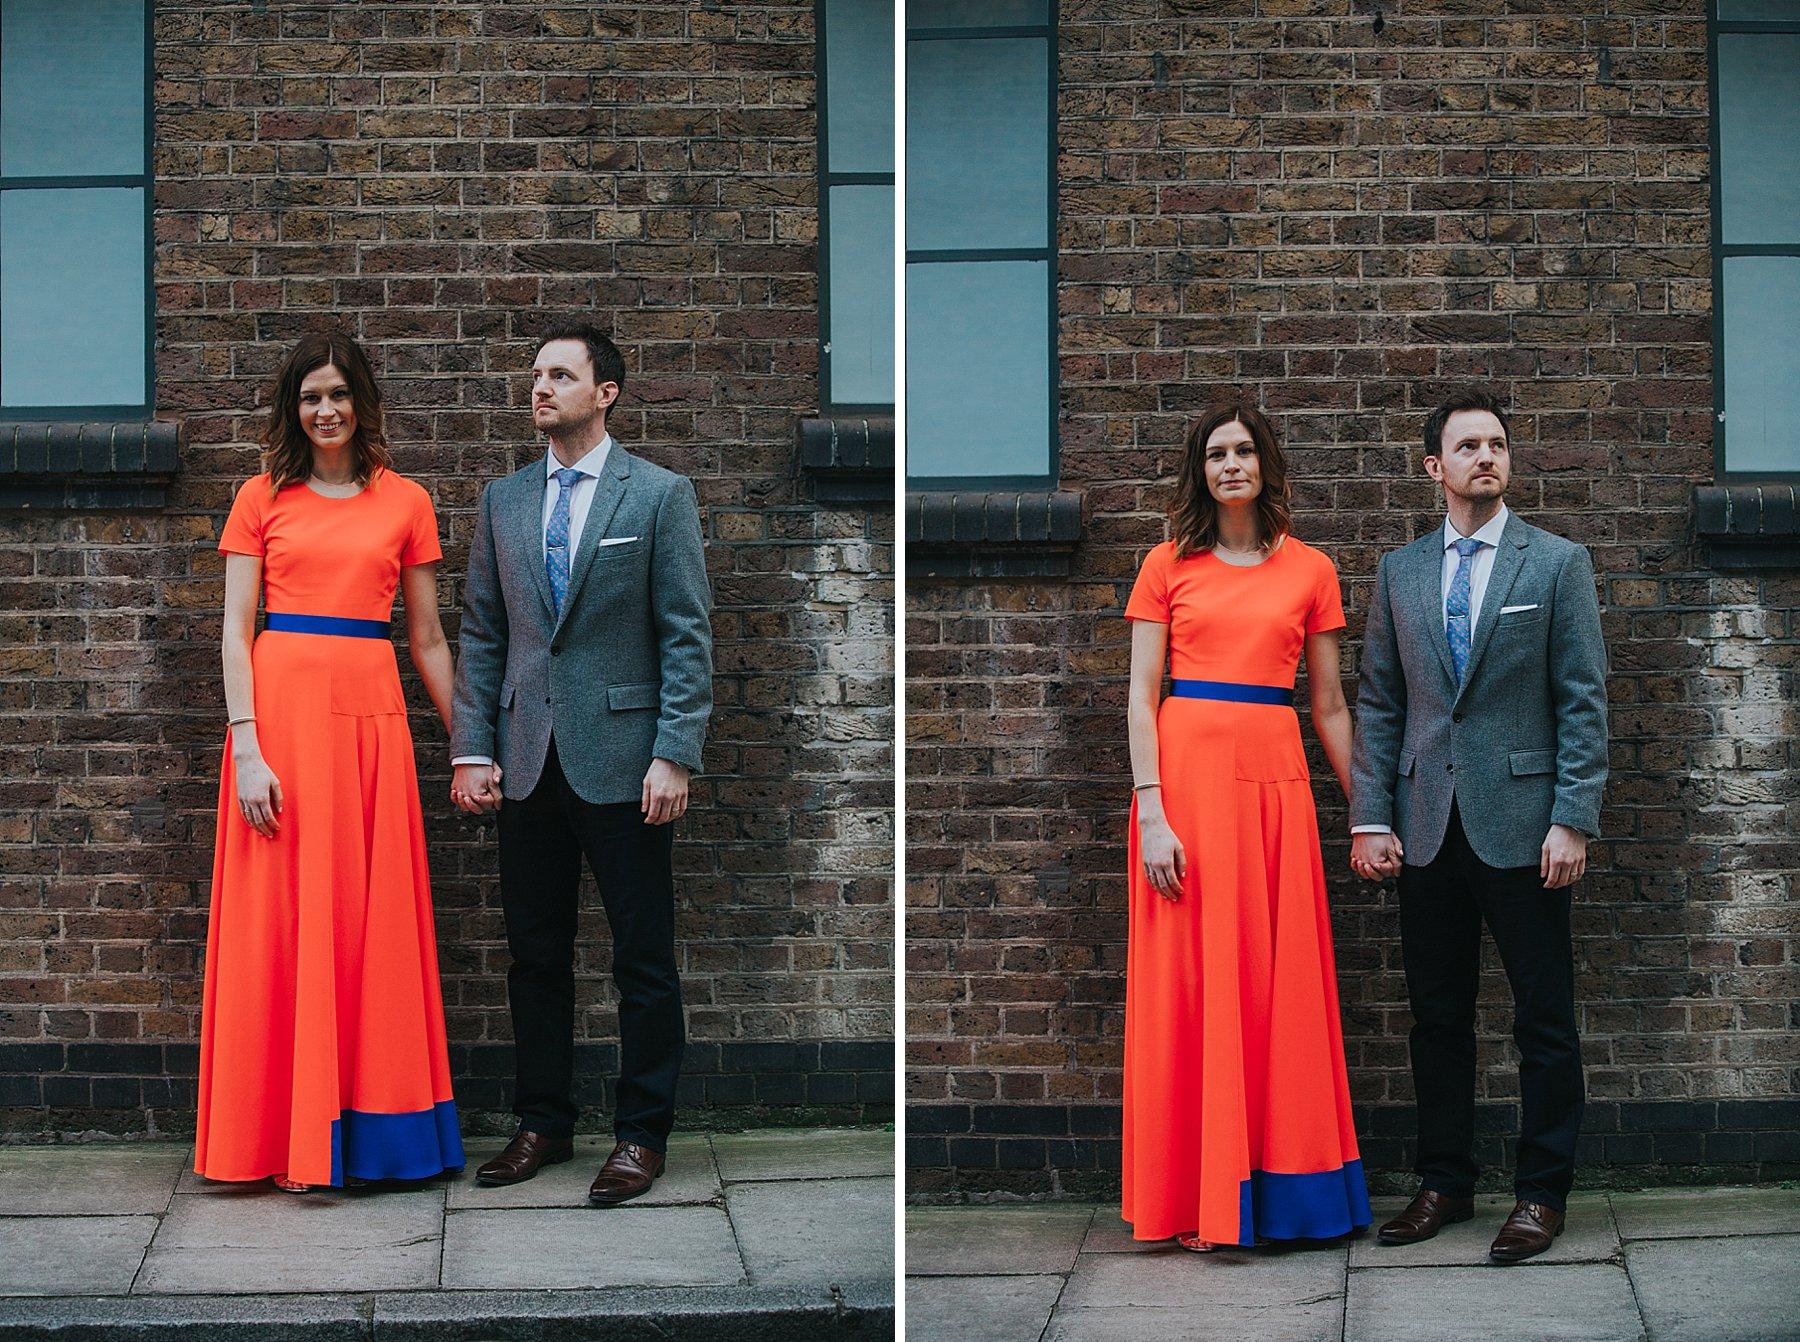 106-gritty urban couple portraits.jpg